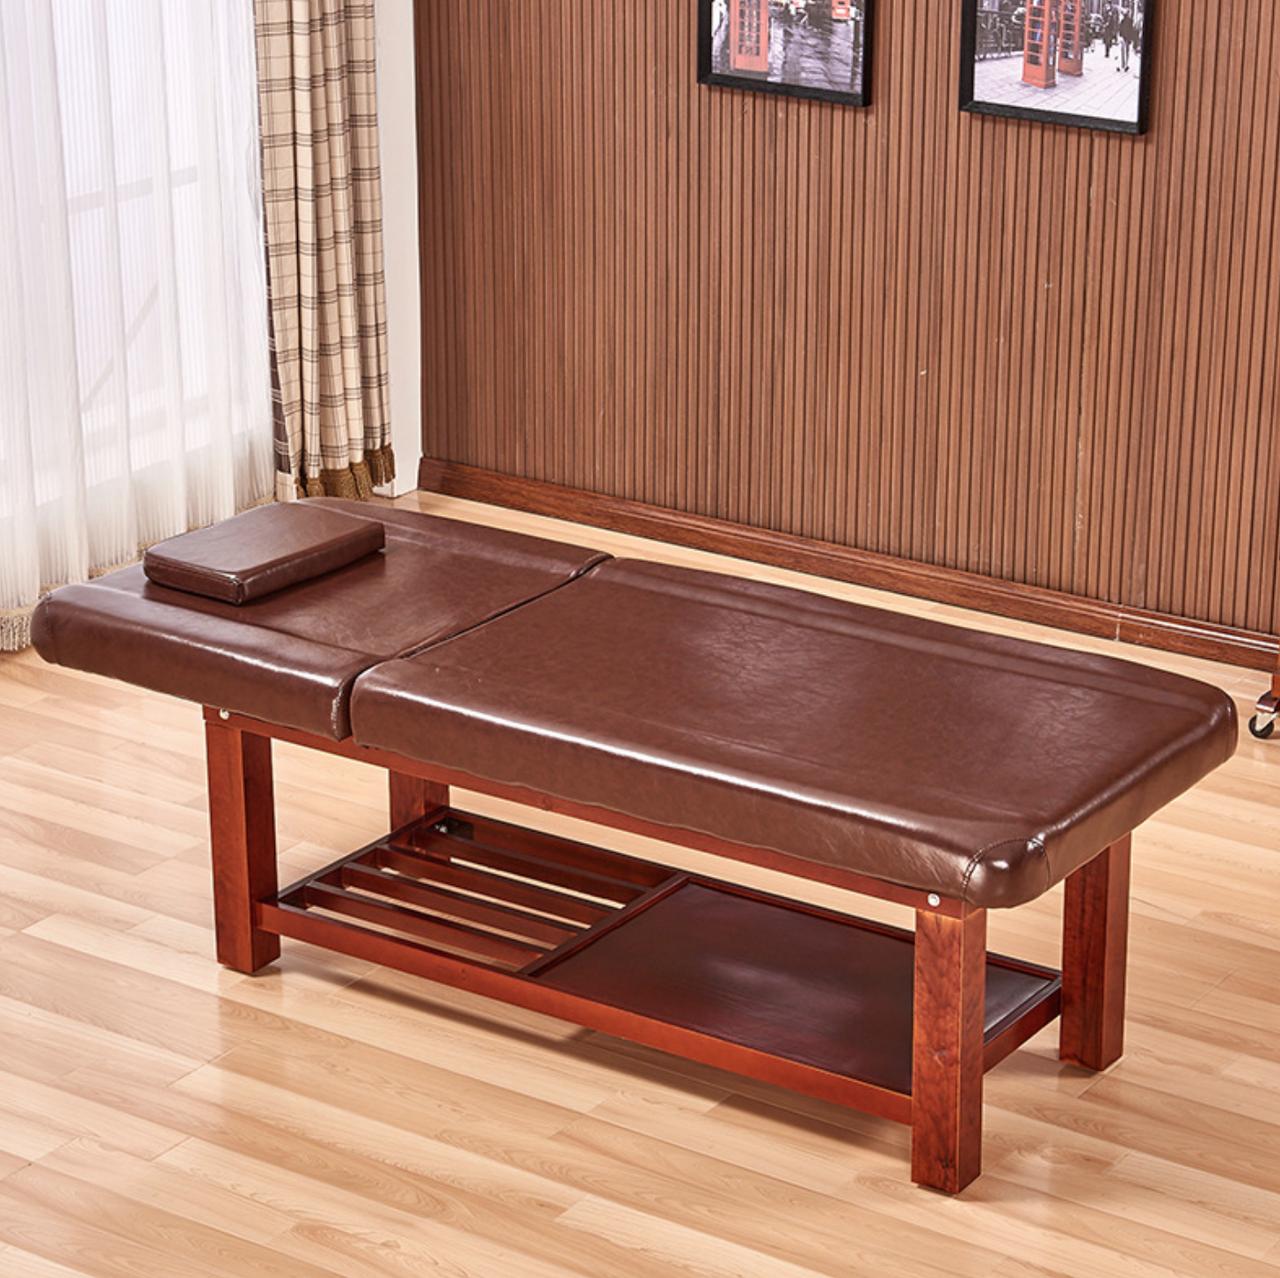 Кушетка - стол для косметолога / массажиста. Люкс качество! - фото 8